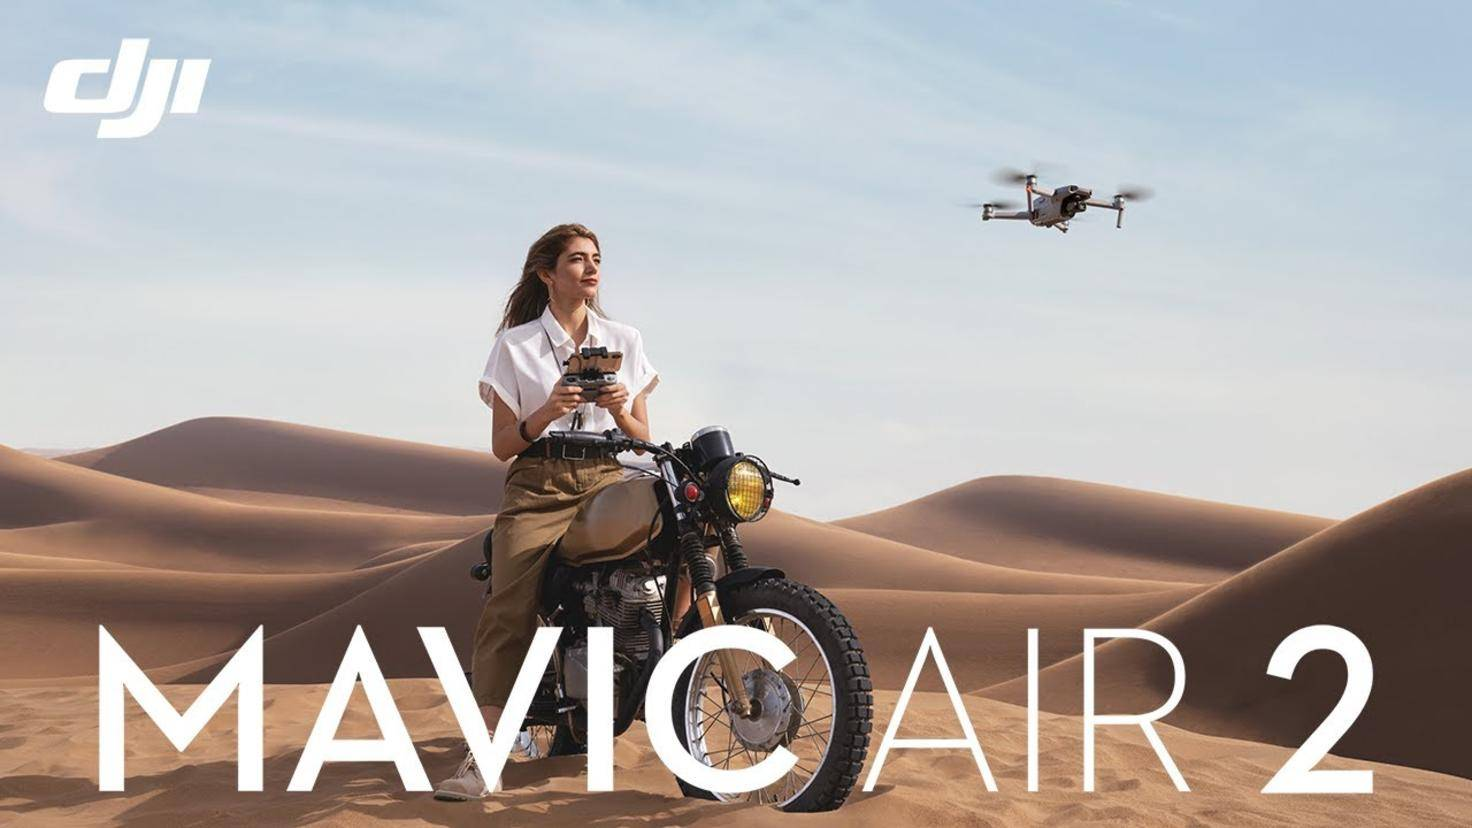 dji-mavic-air-2-produktfoto